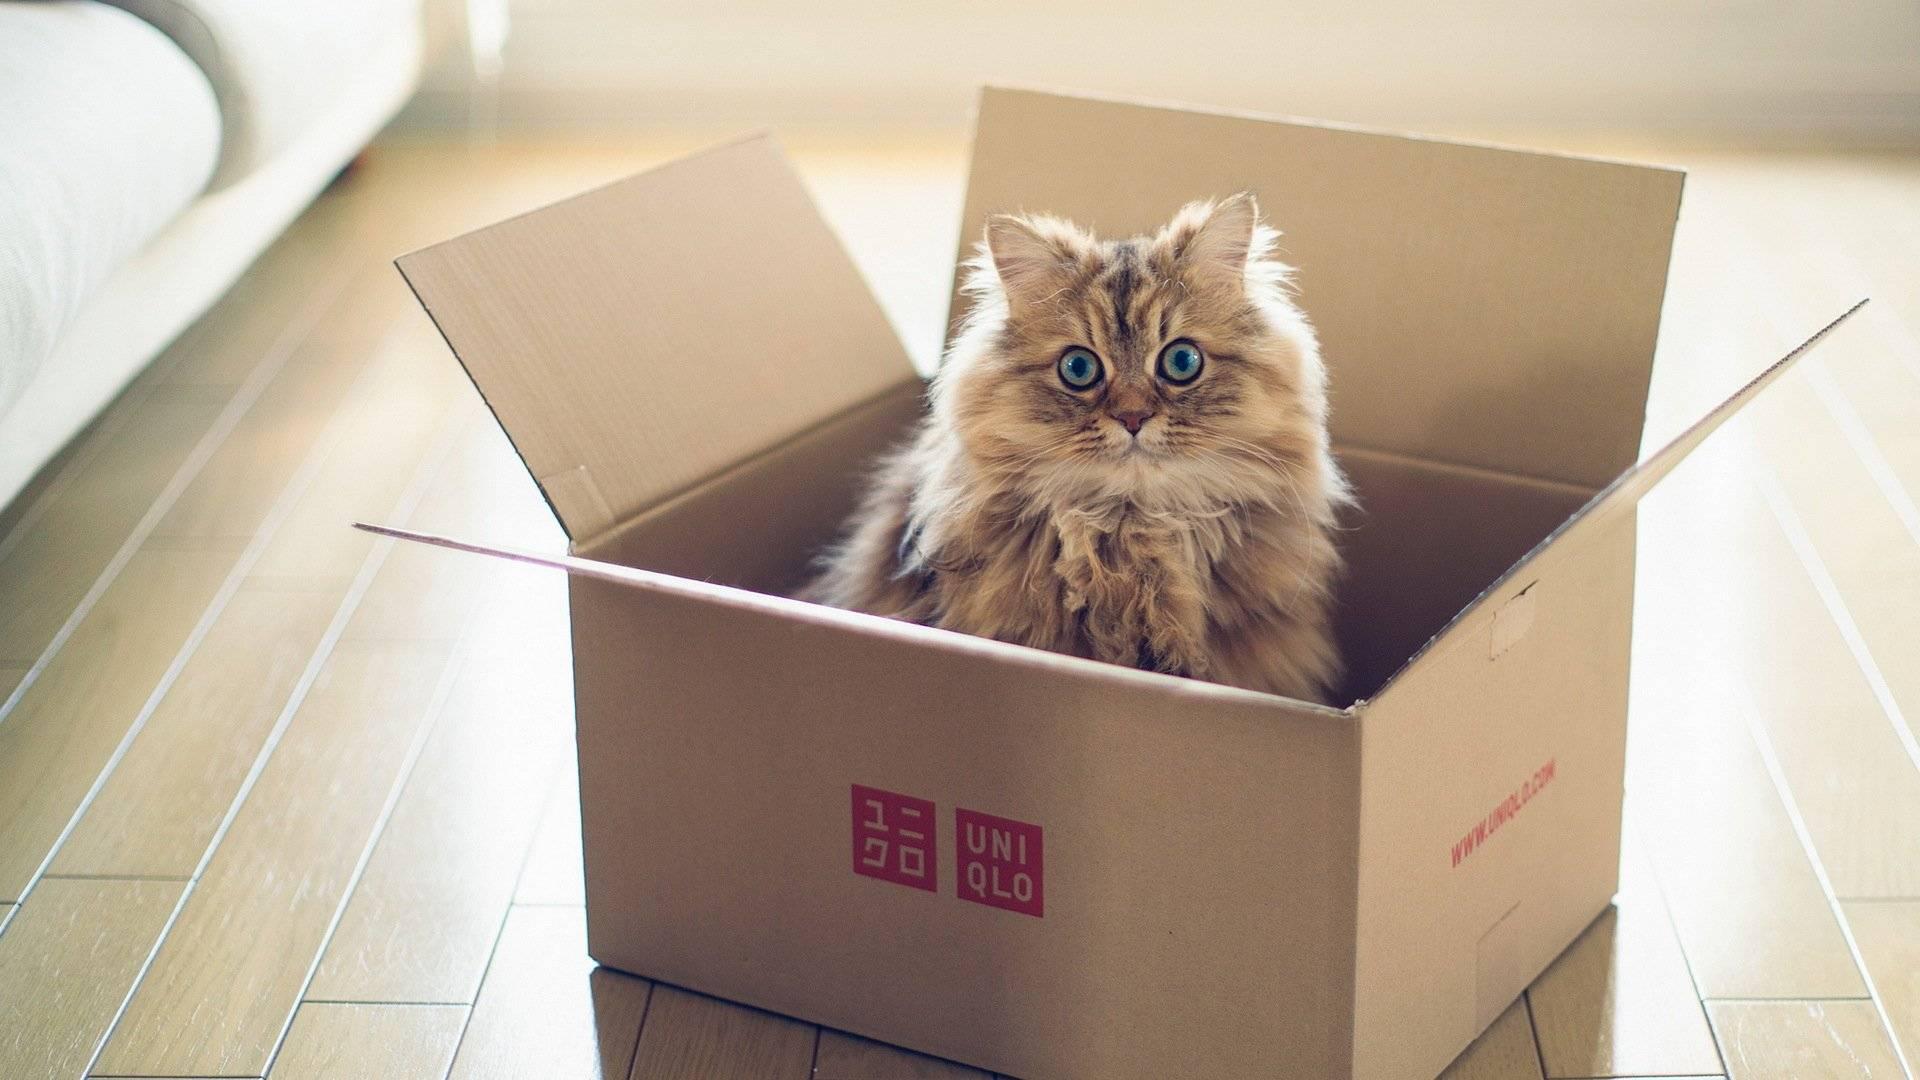 Тайна века: почему кошки так любят коробки?